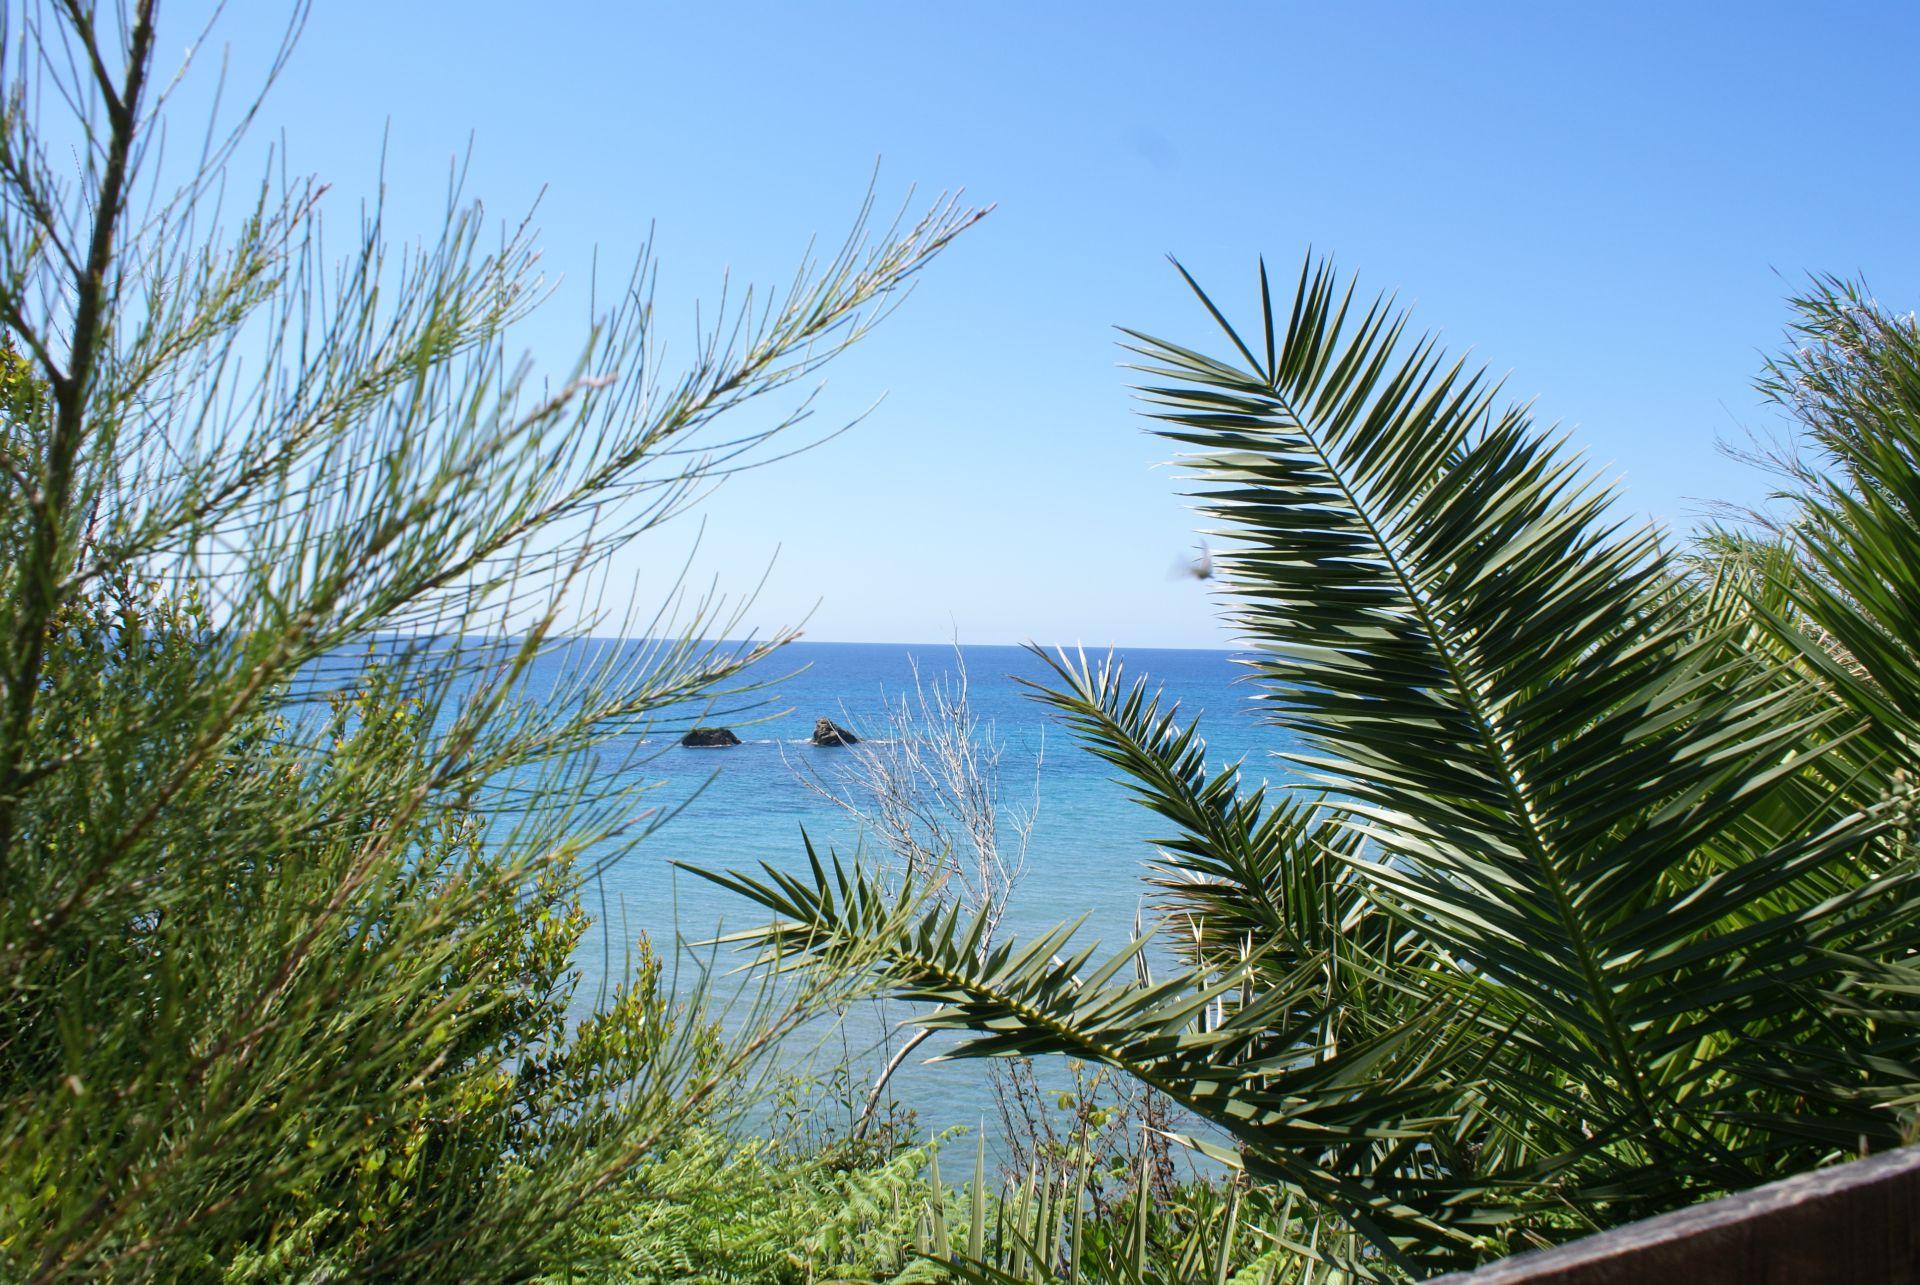 Korfu Strandvilla Meliti, Kanouli, Agios Matheos, Korfu exklusiv, KorfuCorfu